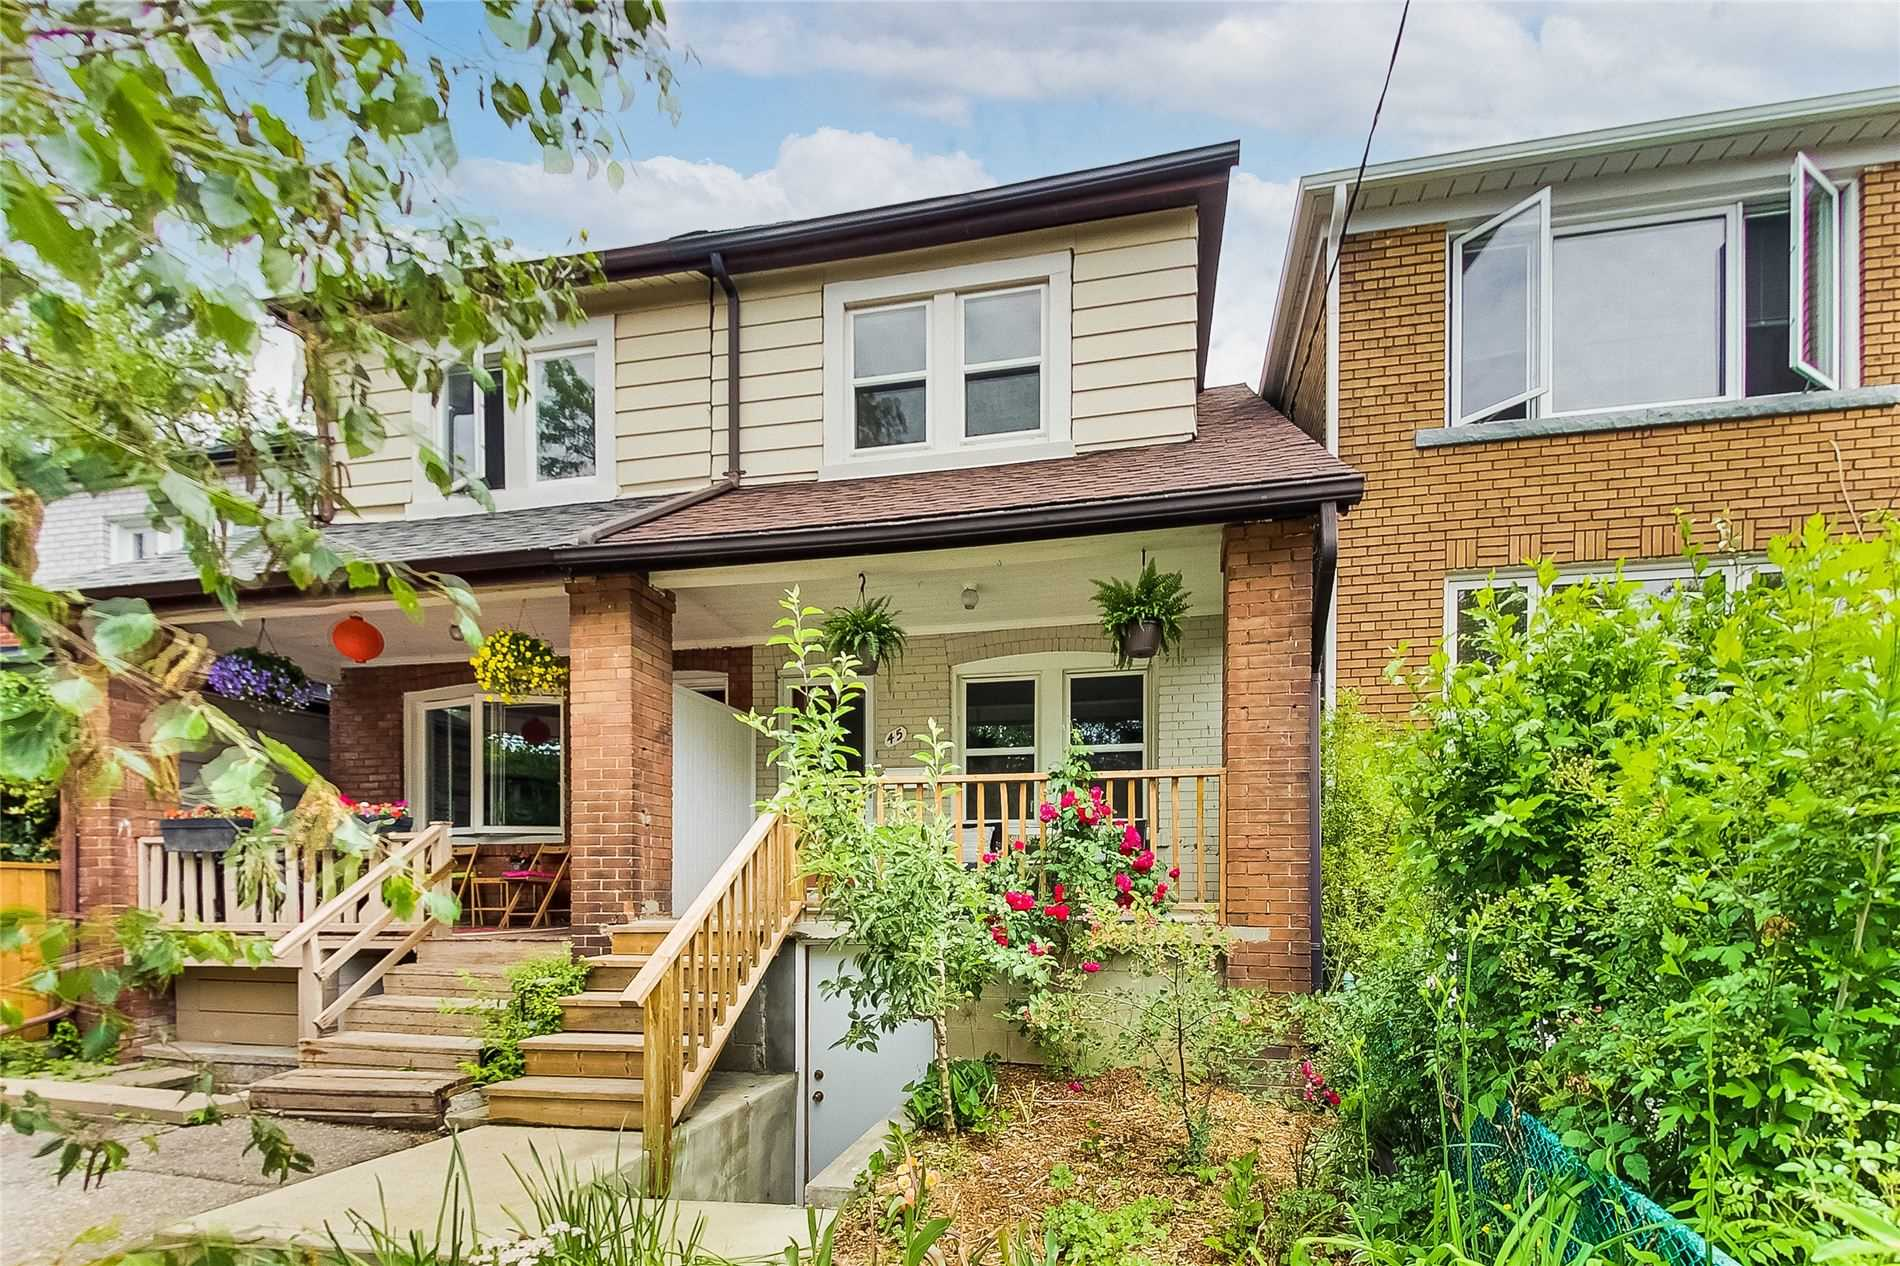 45 Kenwood Ave, Toronto, Ontario M6C2R8, 3 Bedrooms Bedrooms, 7 Rooms Rooms,2 BathroomsBathrooms,Semi-detached,For Sale,Kenwood,C5289863